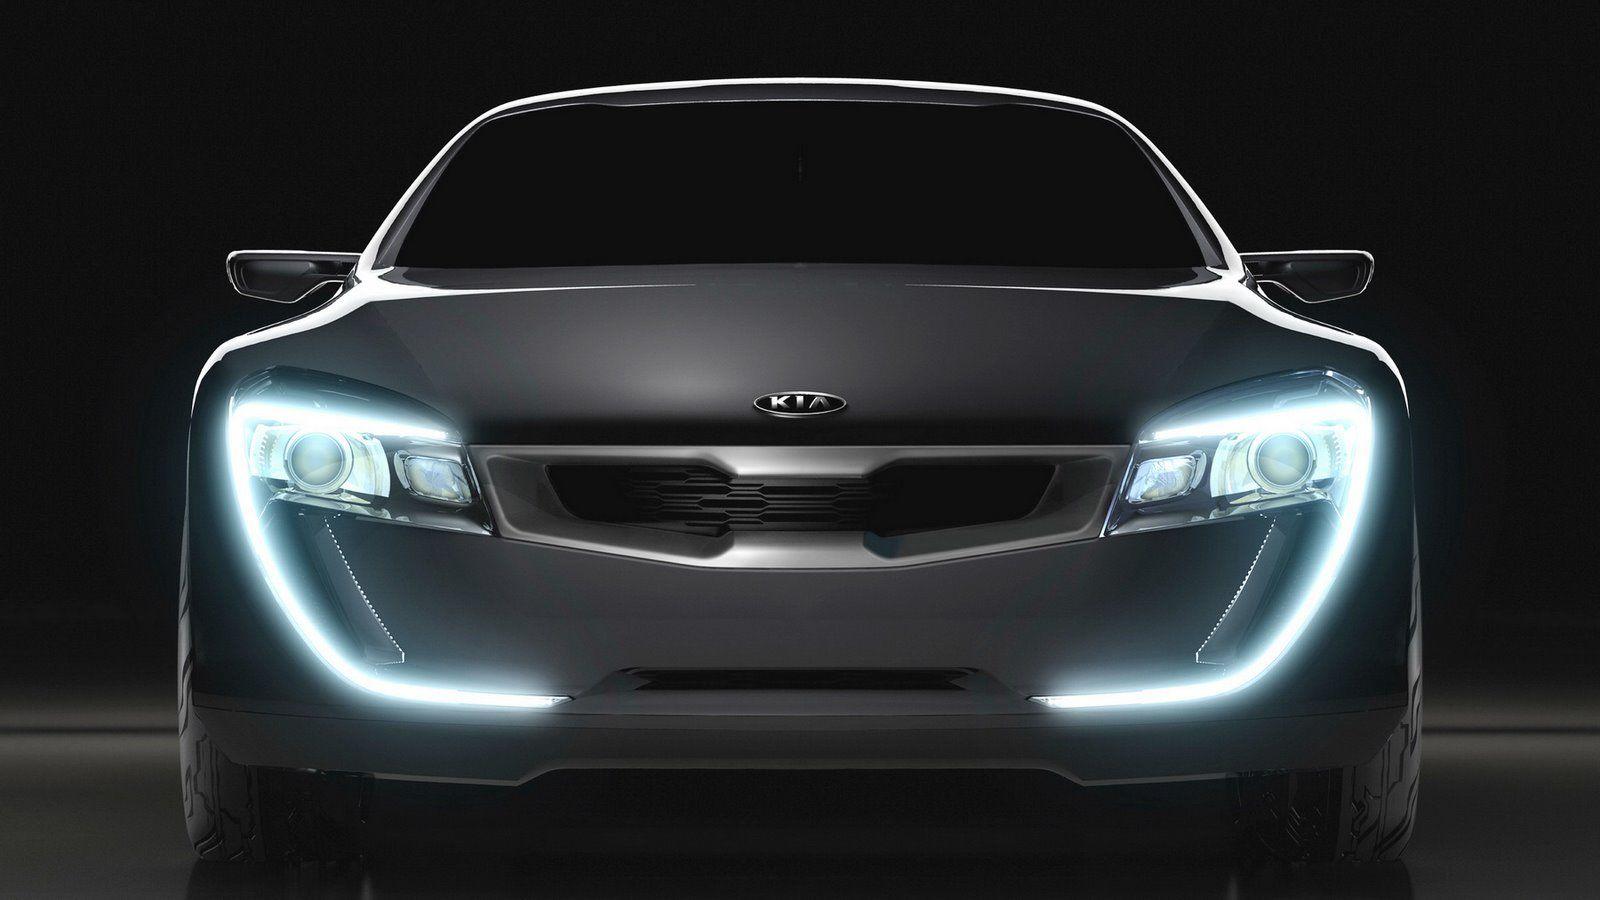 Future sports cars sports car for kia maine hyundai gmc buick cadillac kia infiniti